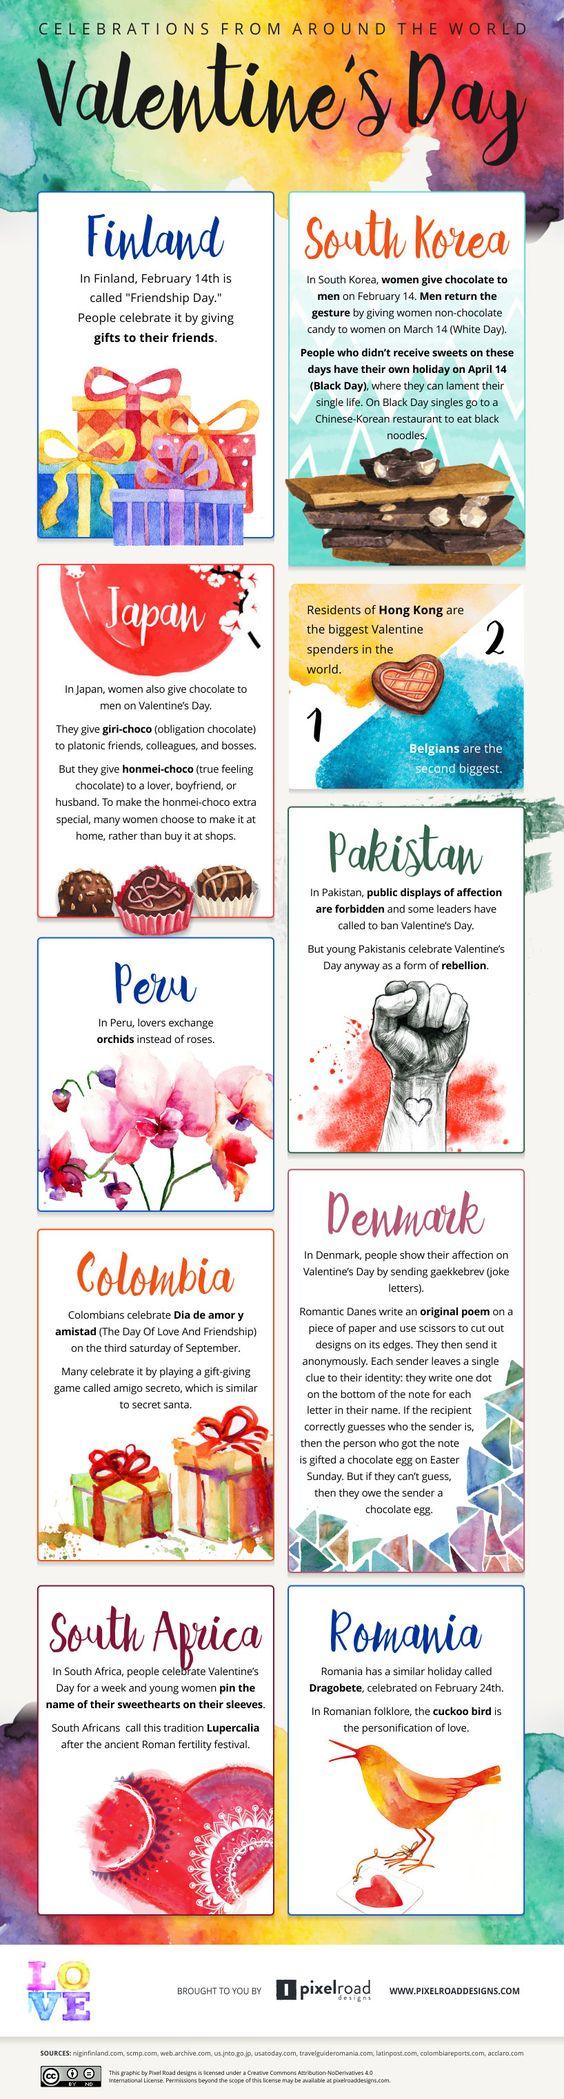 Valentine's Day Infographic Ideas